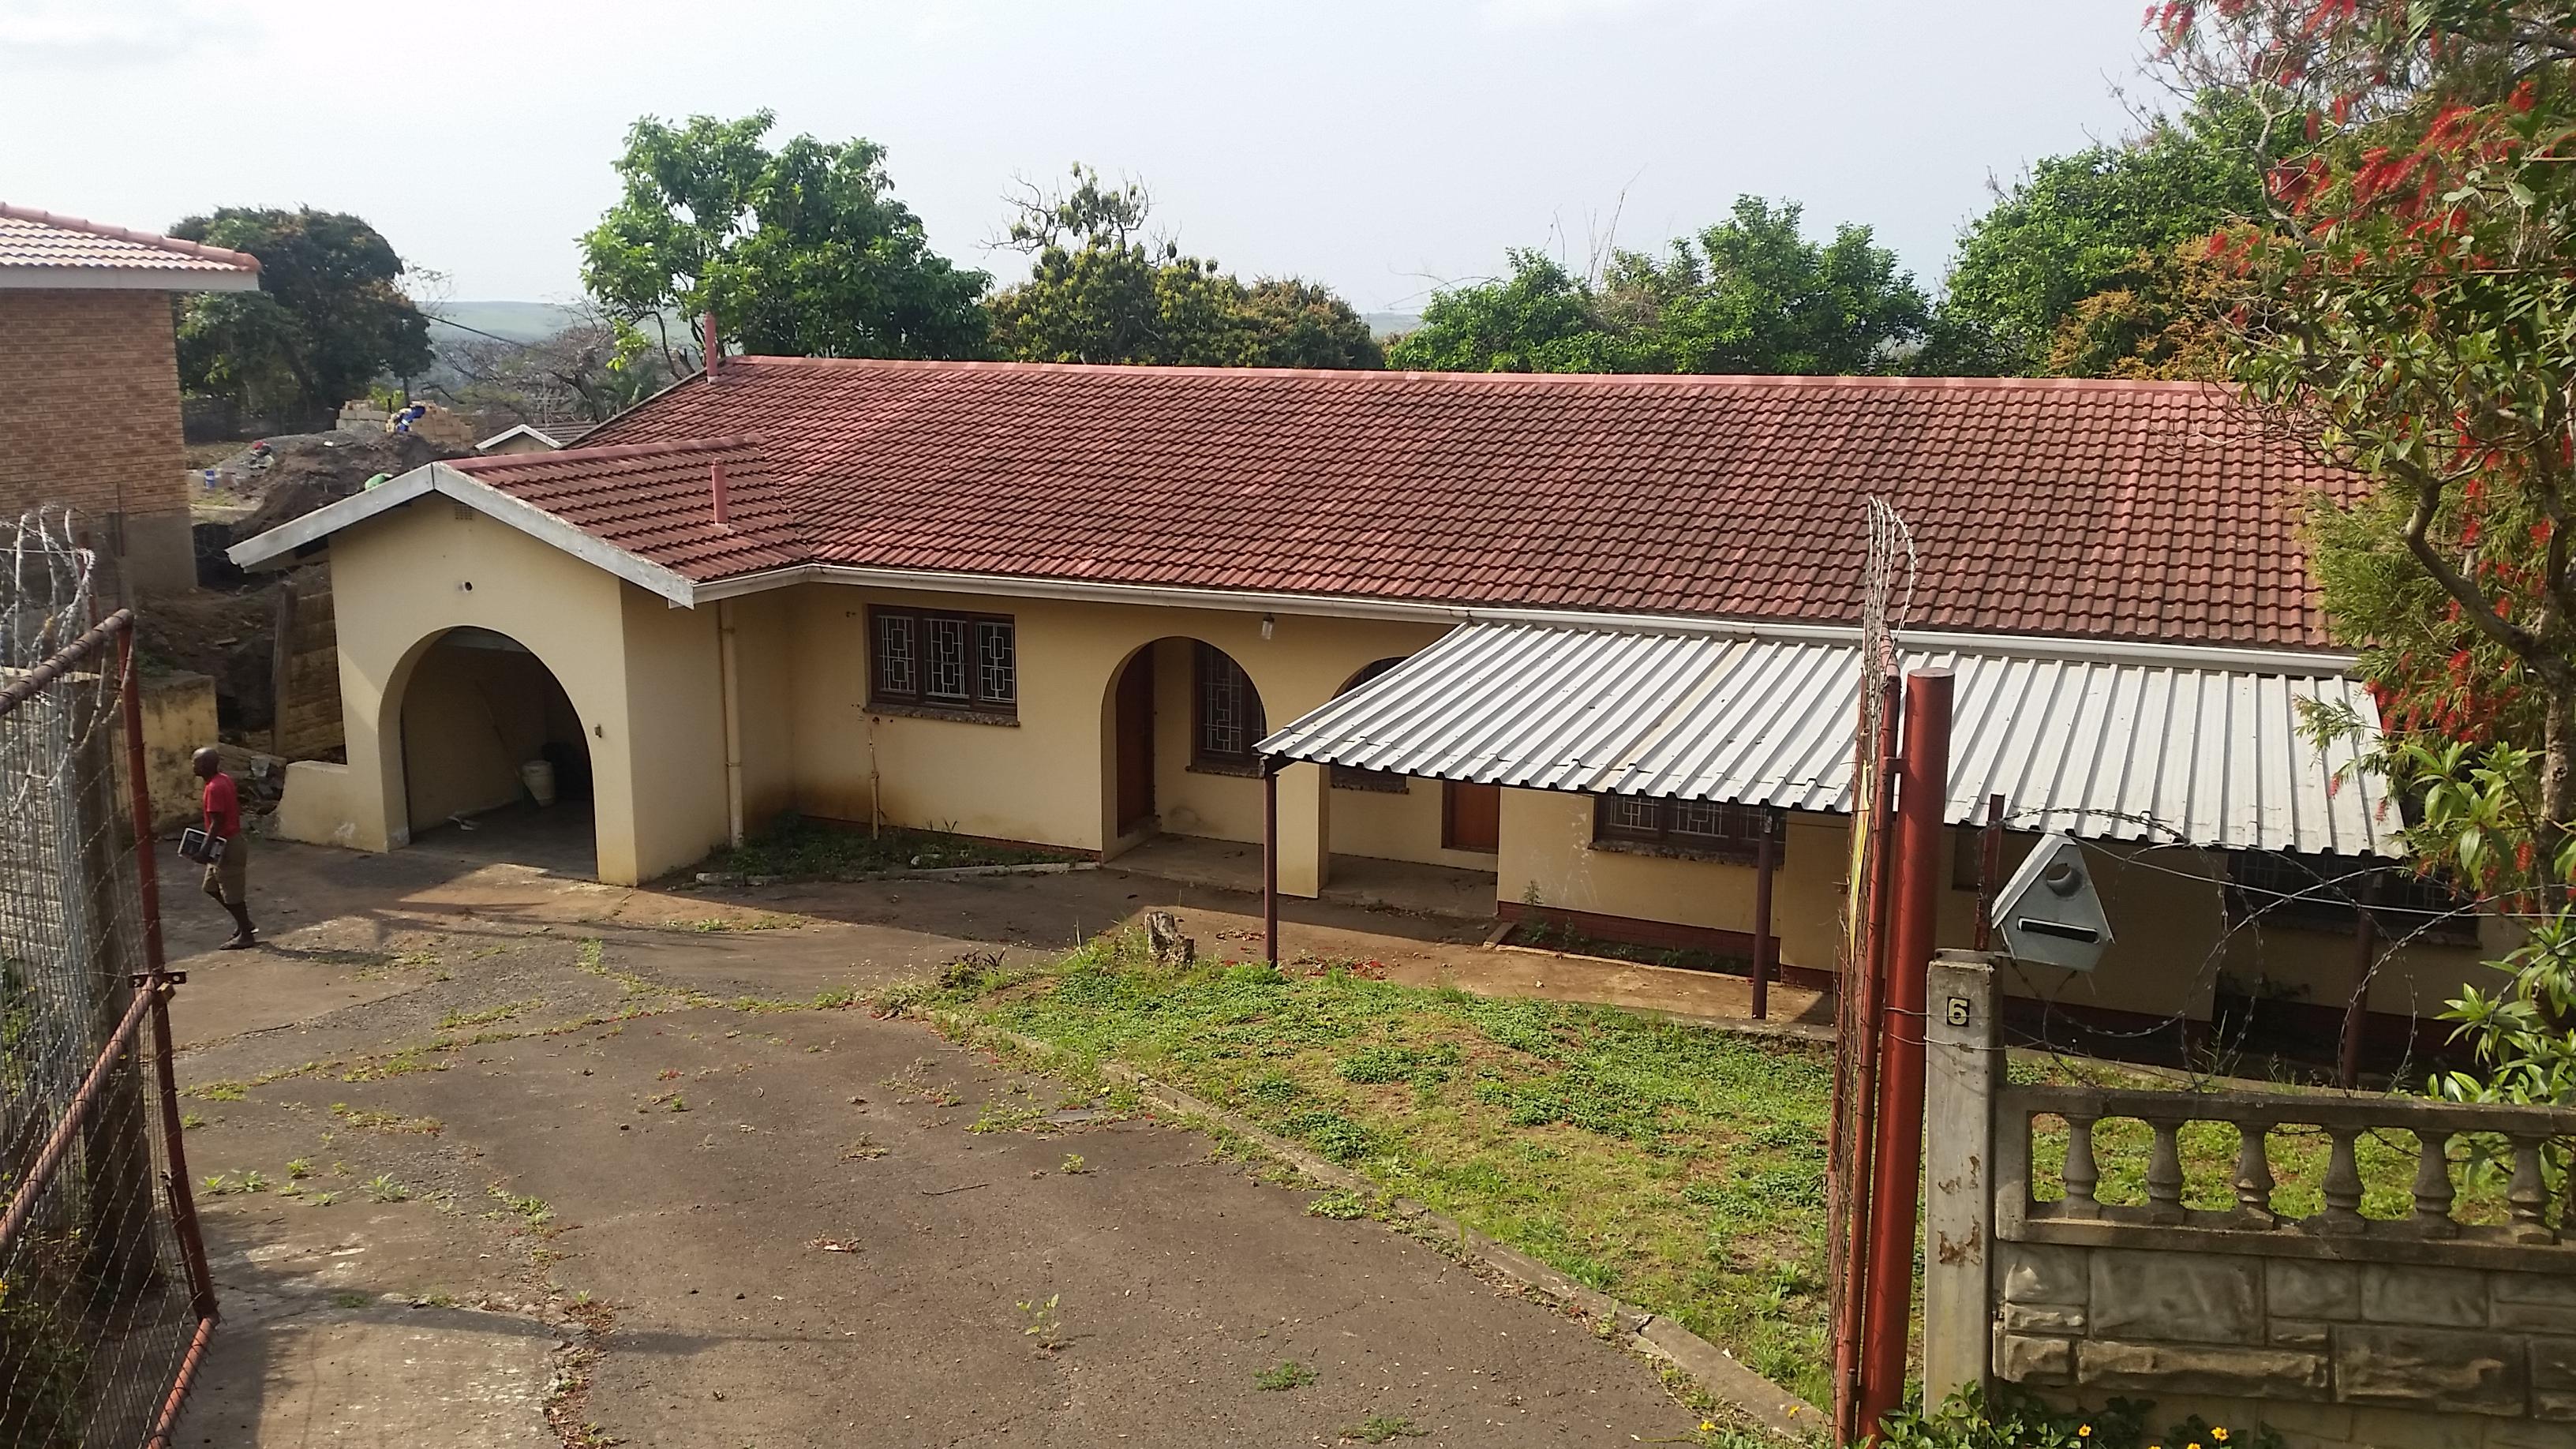 3 BEDROOM HOUSE IN STANGER KZN MASTERS REF: 12630/2010/PMB